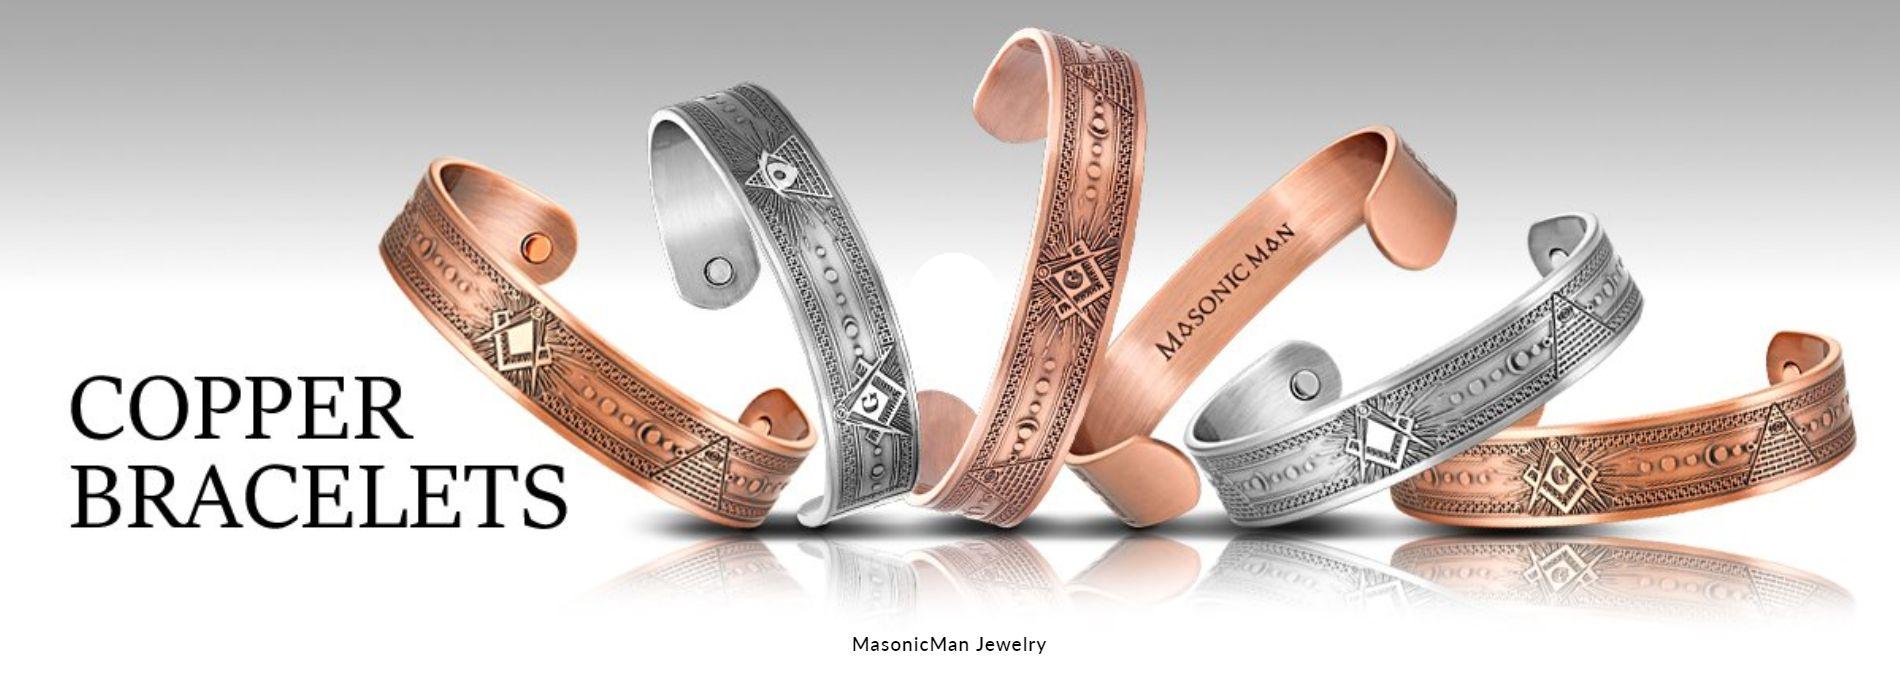 Masonic Bracelets